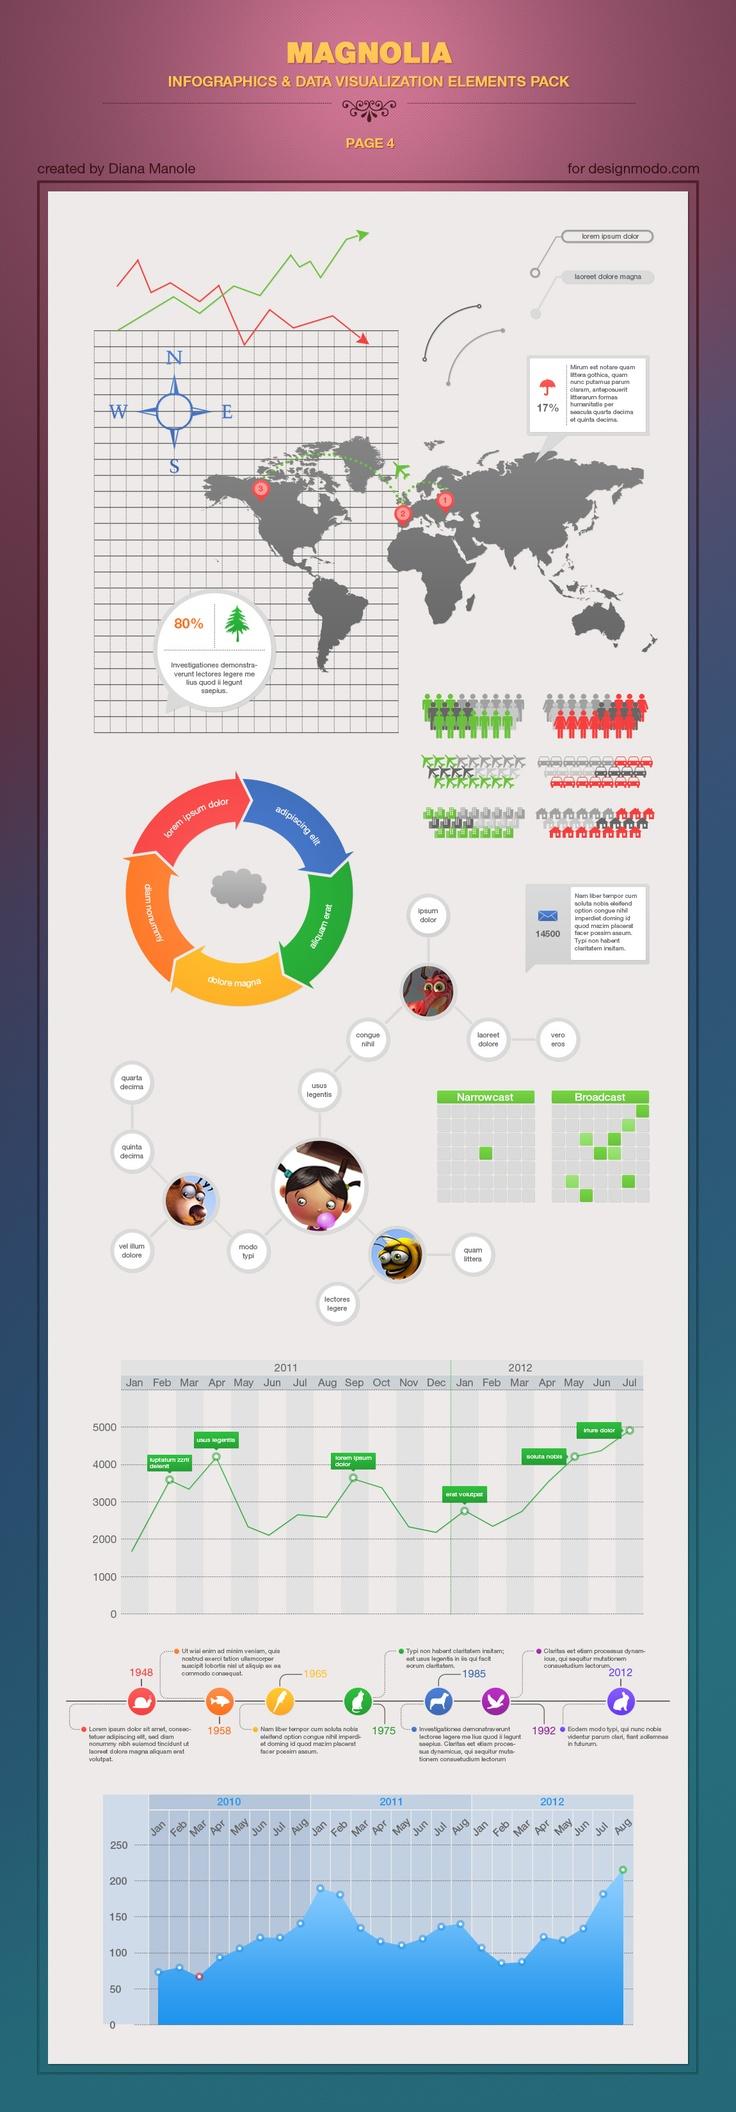 Magnolia – Infographics & Data Visualization Elements Pack